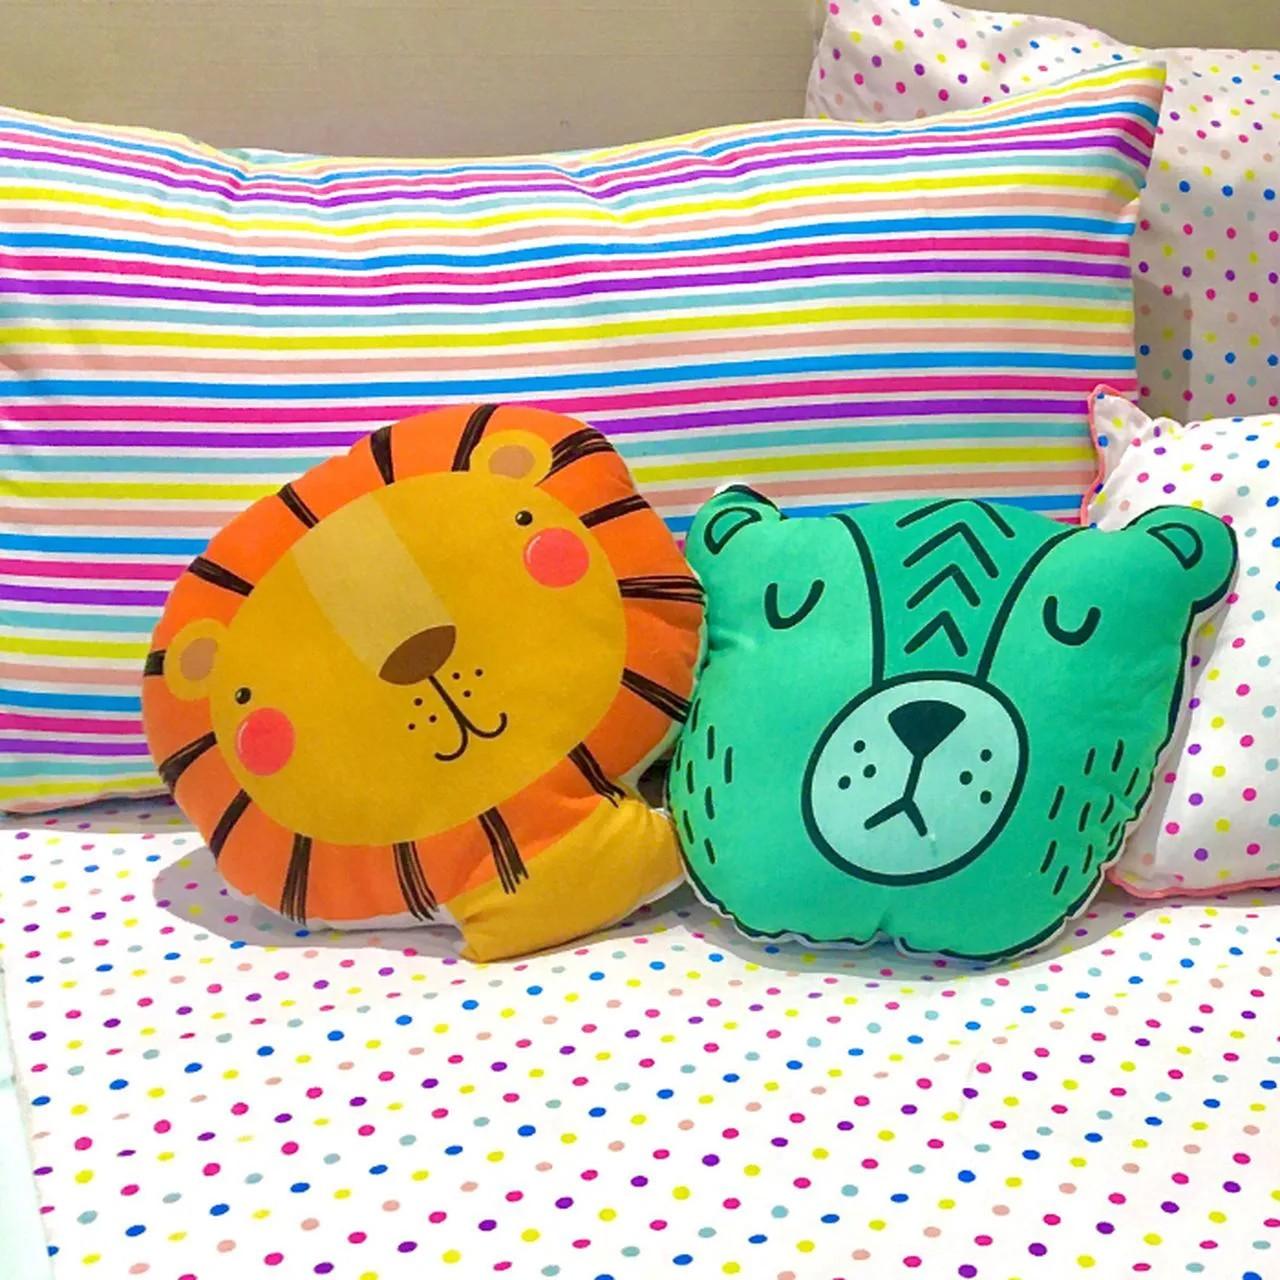 Almofada toy urso Soneca    - Pomelo Decor